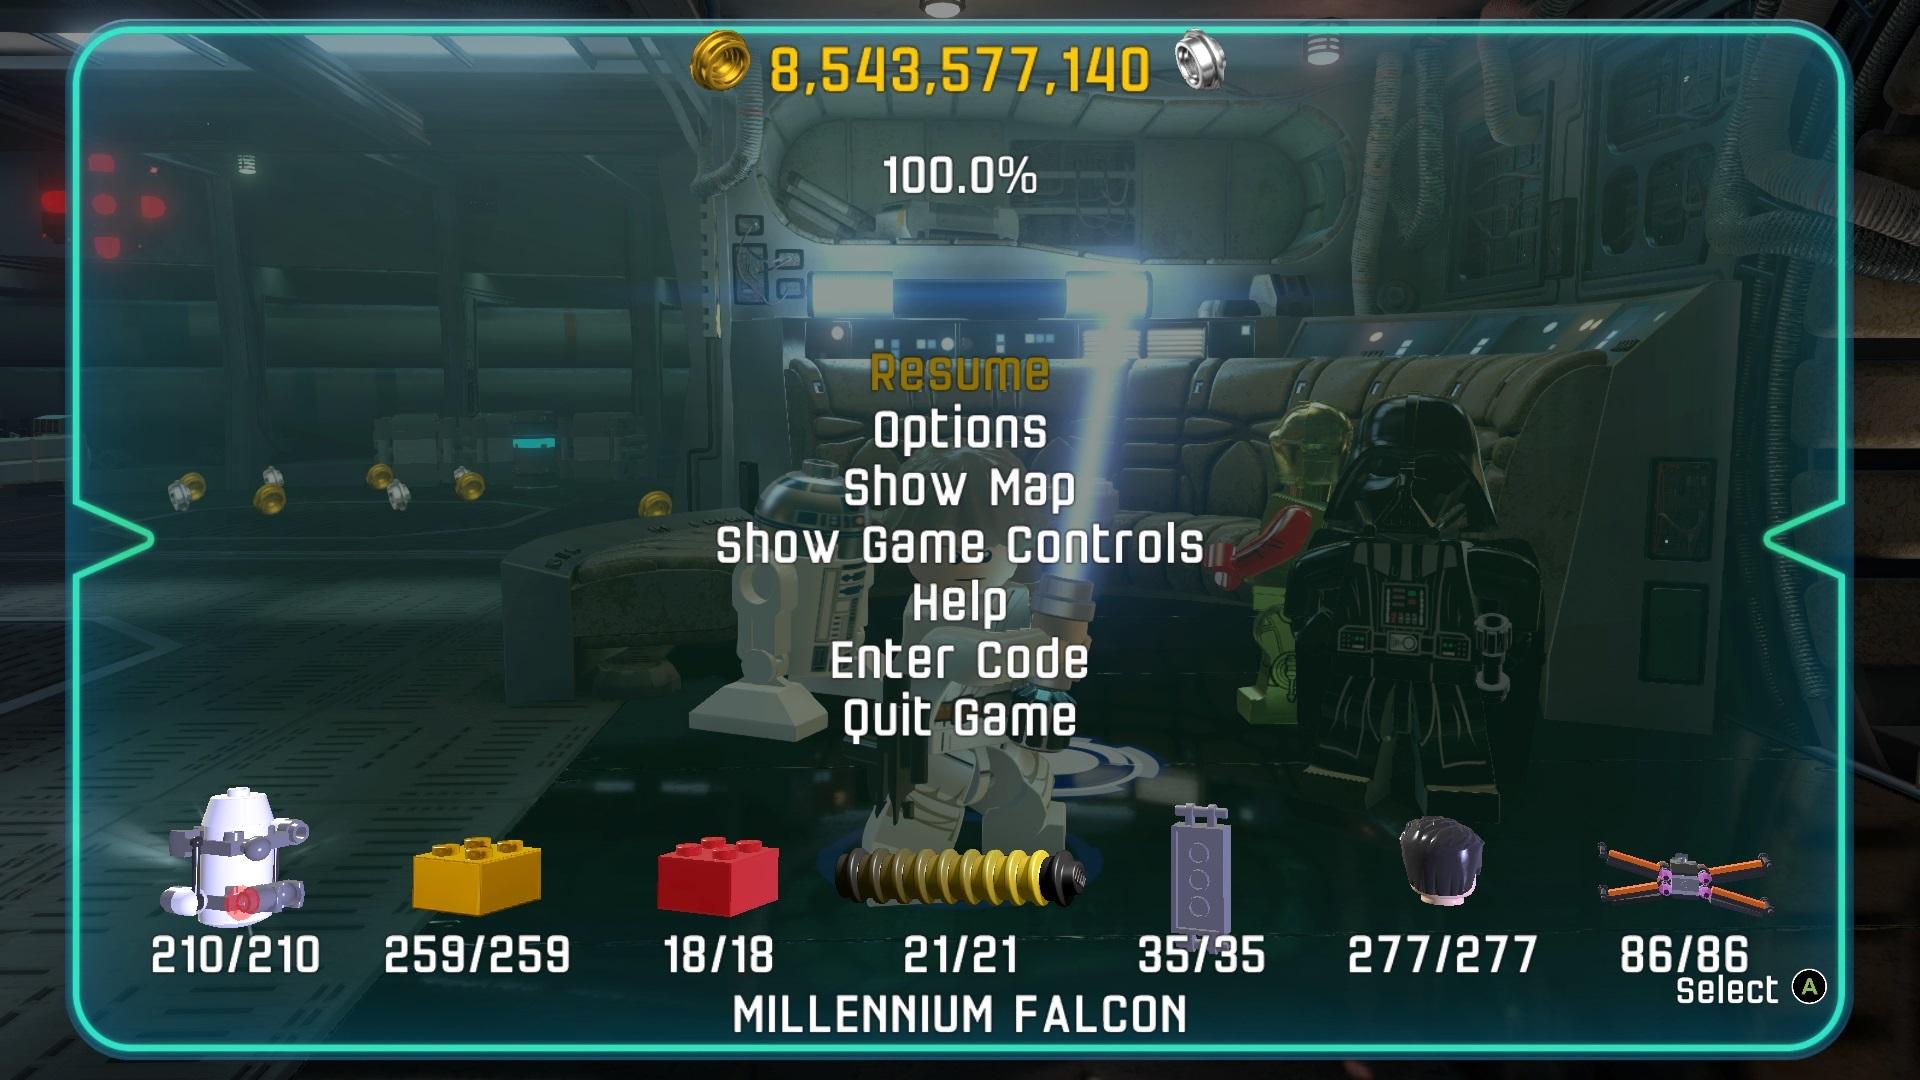 LEGO_Star_Wars_The_Force_Awakens_Xbox_One_SS_2.jpg